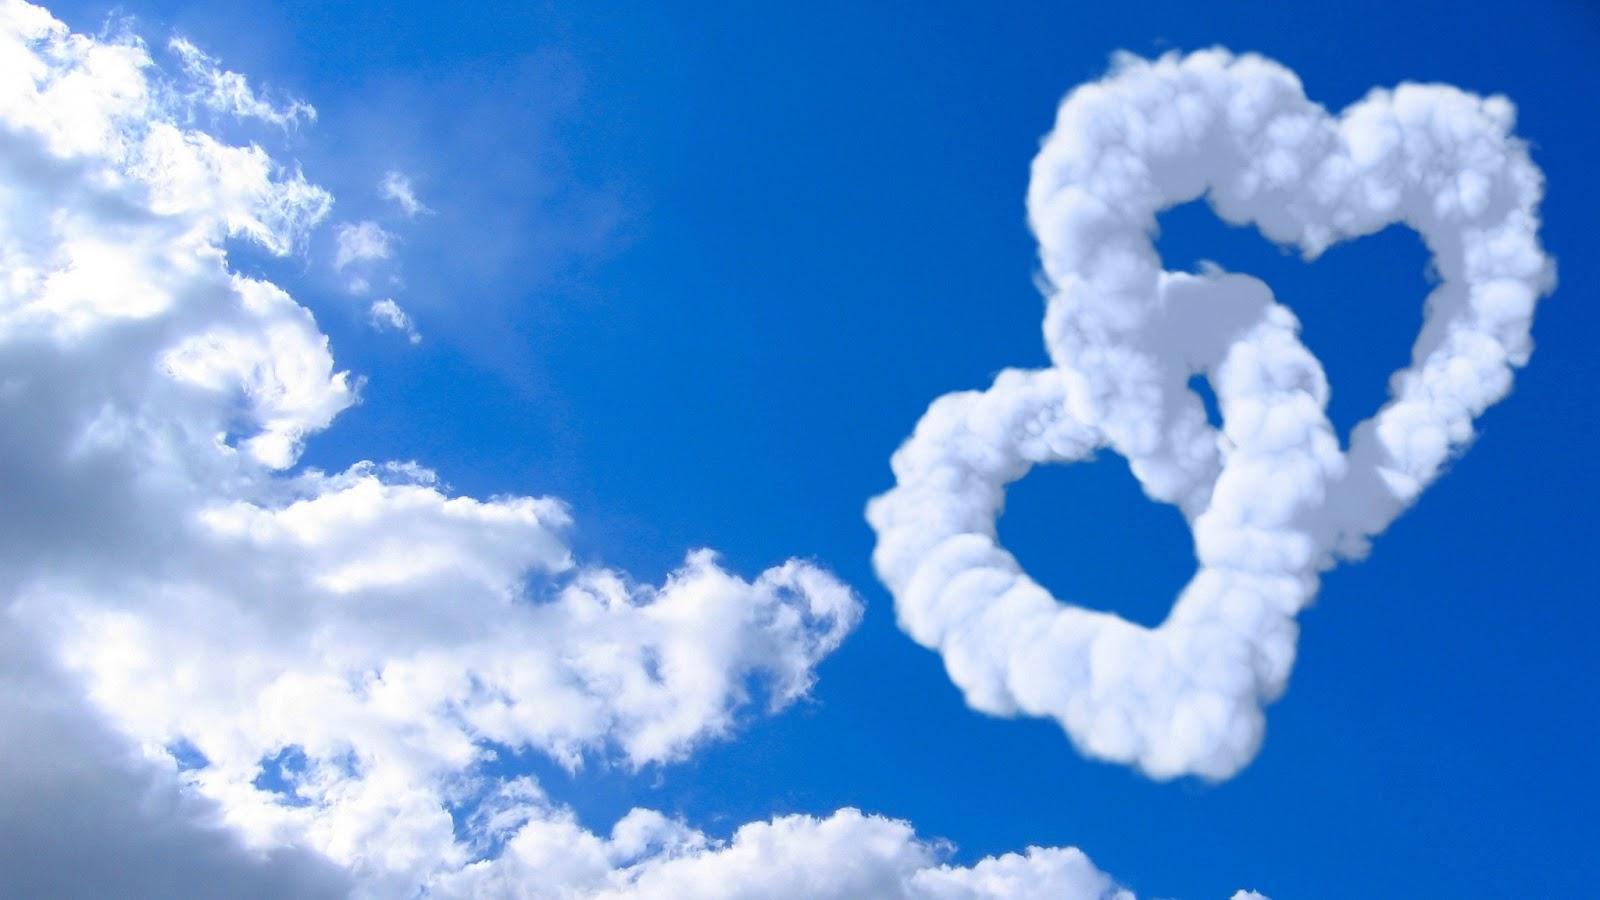 Free Wallpaper Dekstop: 3d love with clouds wallpaper, wallpaper for desktop